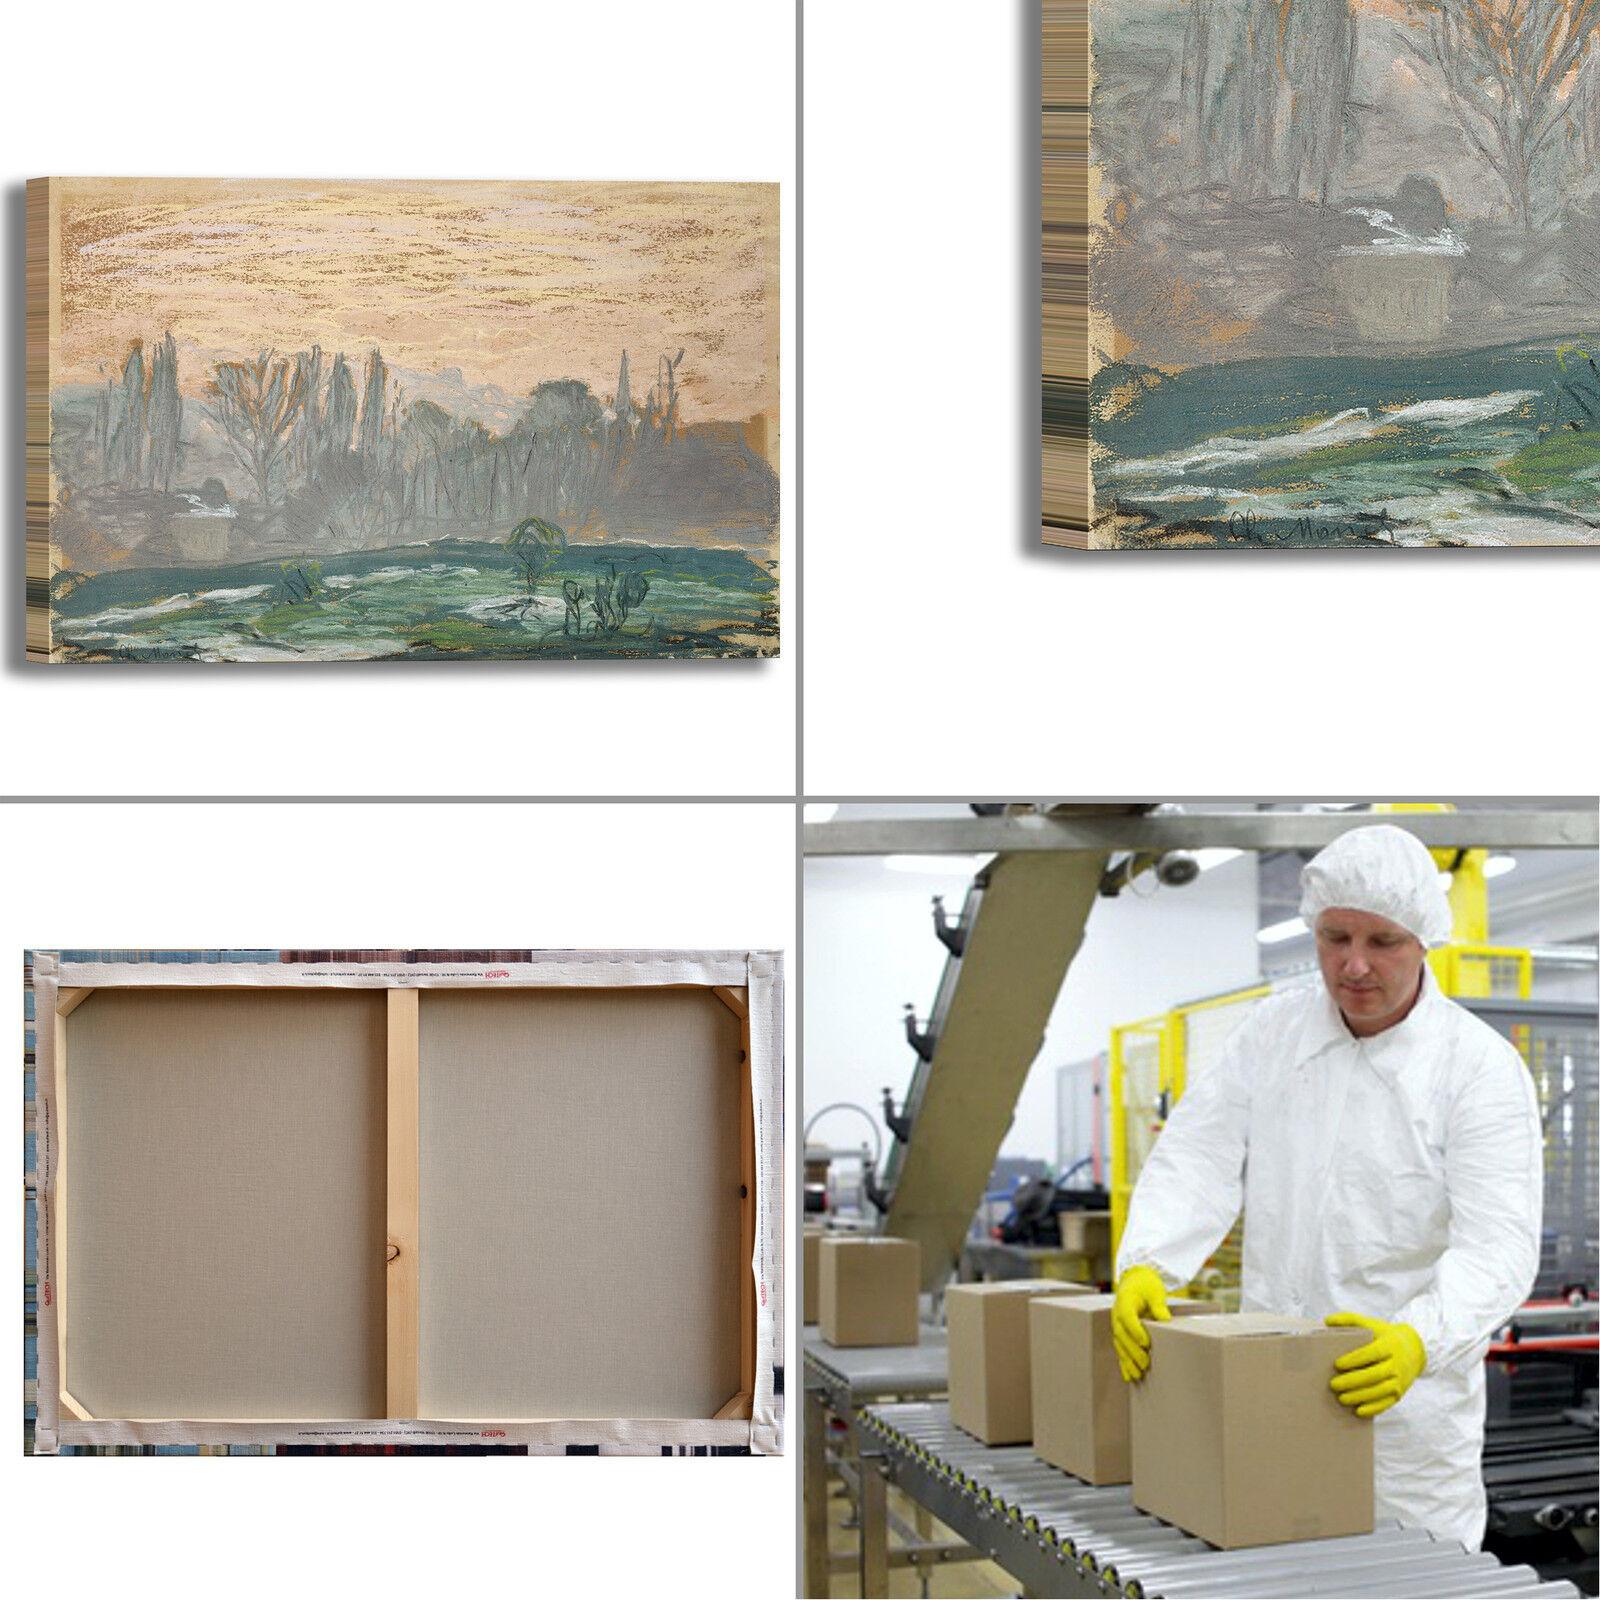 Monet quadro paesaggio invernale design quadro Monet stampa tela dipinto telaio arRouge o casa 144977